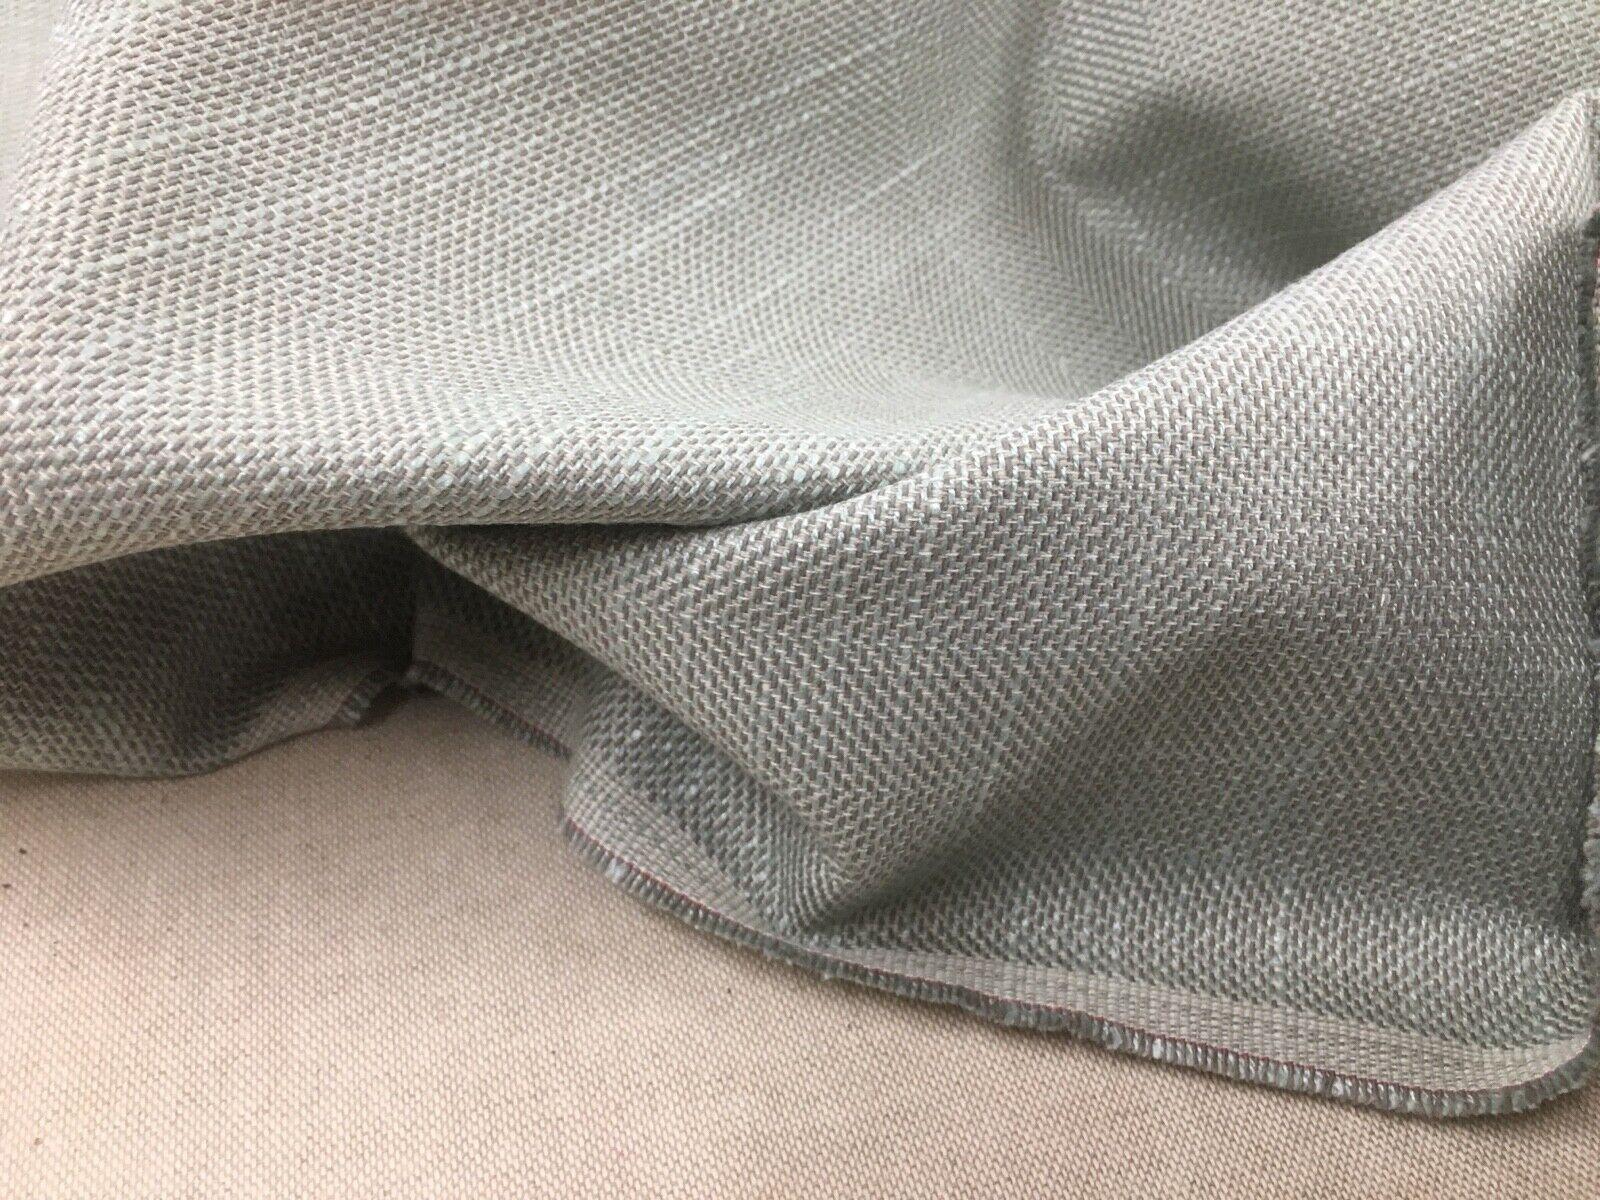 Scandi Twill Linen Sea Spray Blue Green Upholstery Fabric 140cm wide